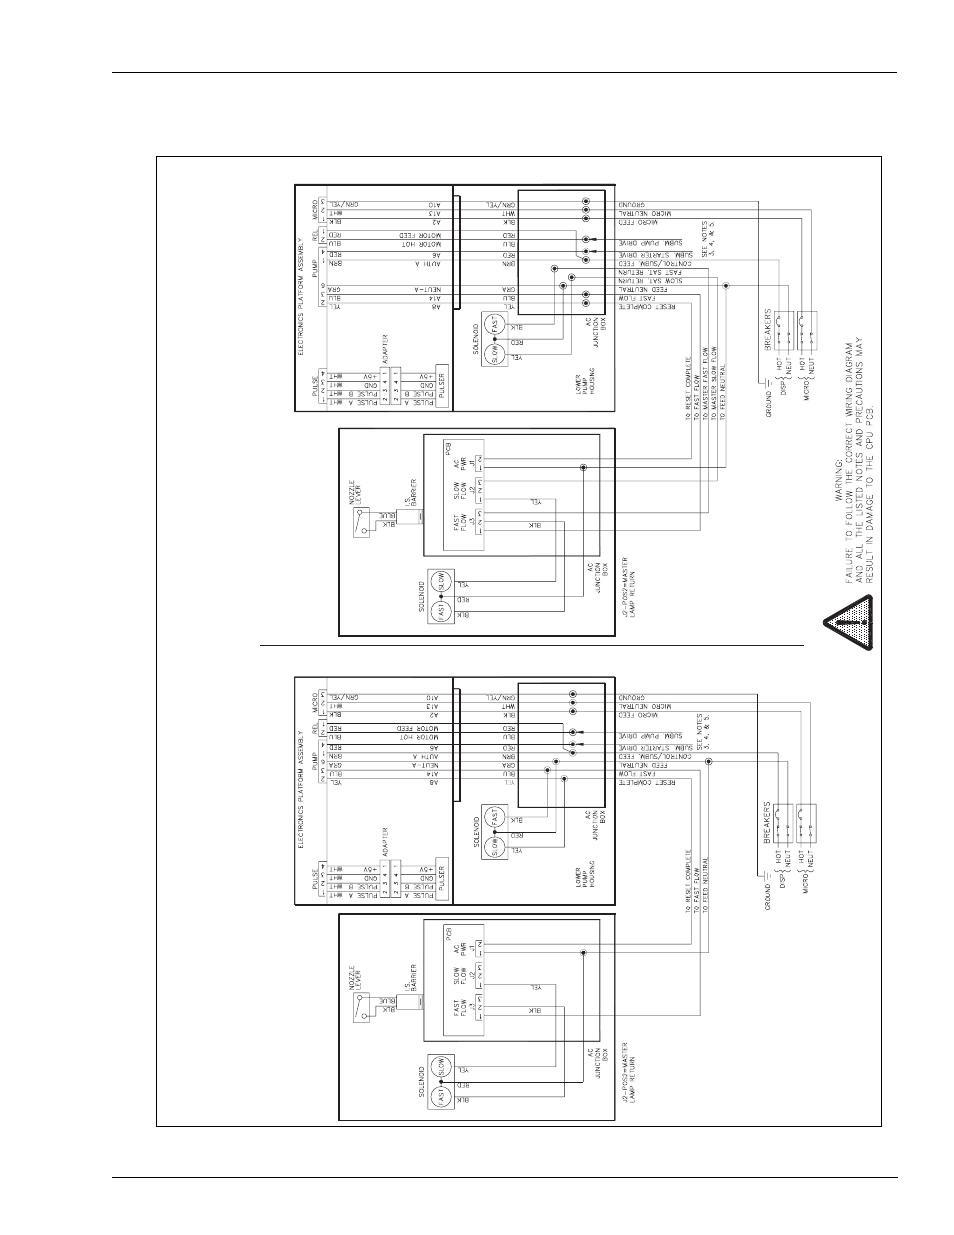 gasboy 9216k page25 gasboy wiring diagram wiring diagrams  at edmiracle.co